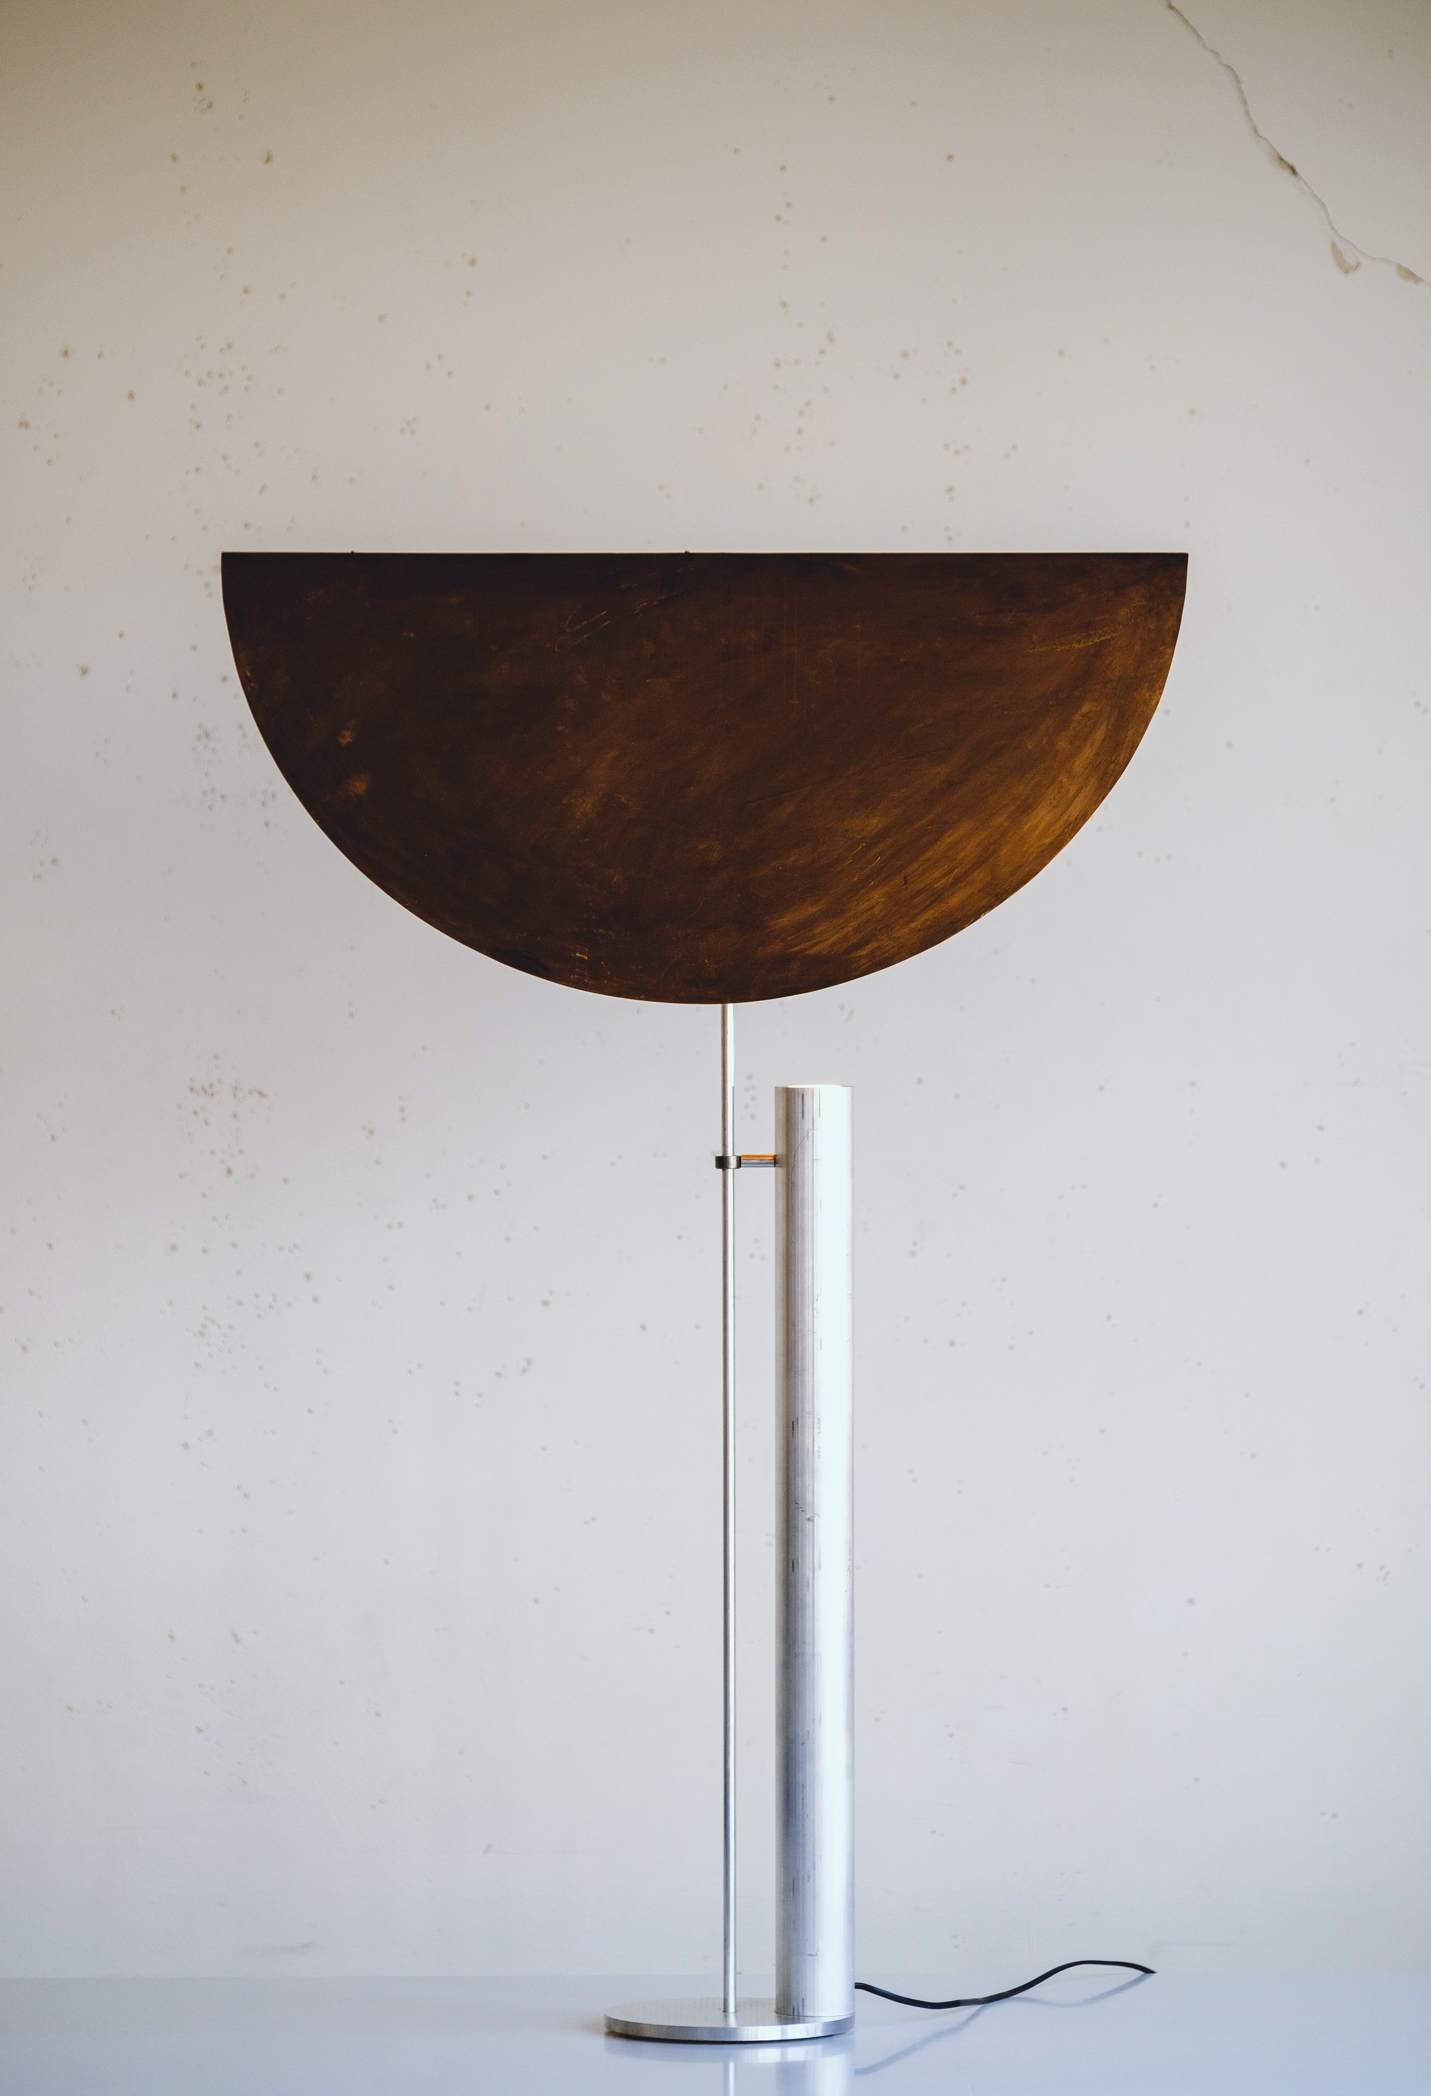 Minimalist Floor Lamp ''Copper Shade'' by Raphael Kadid